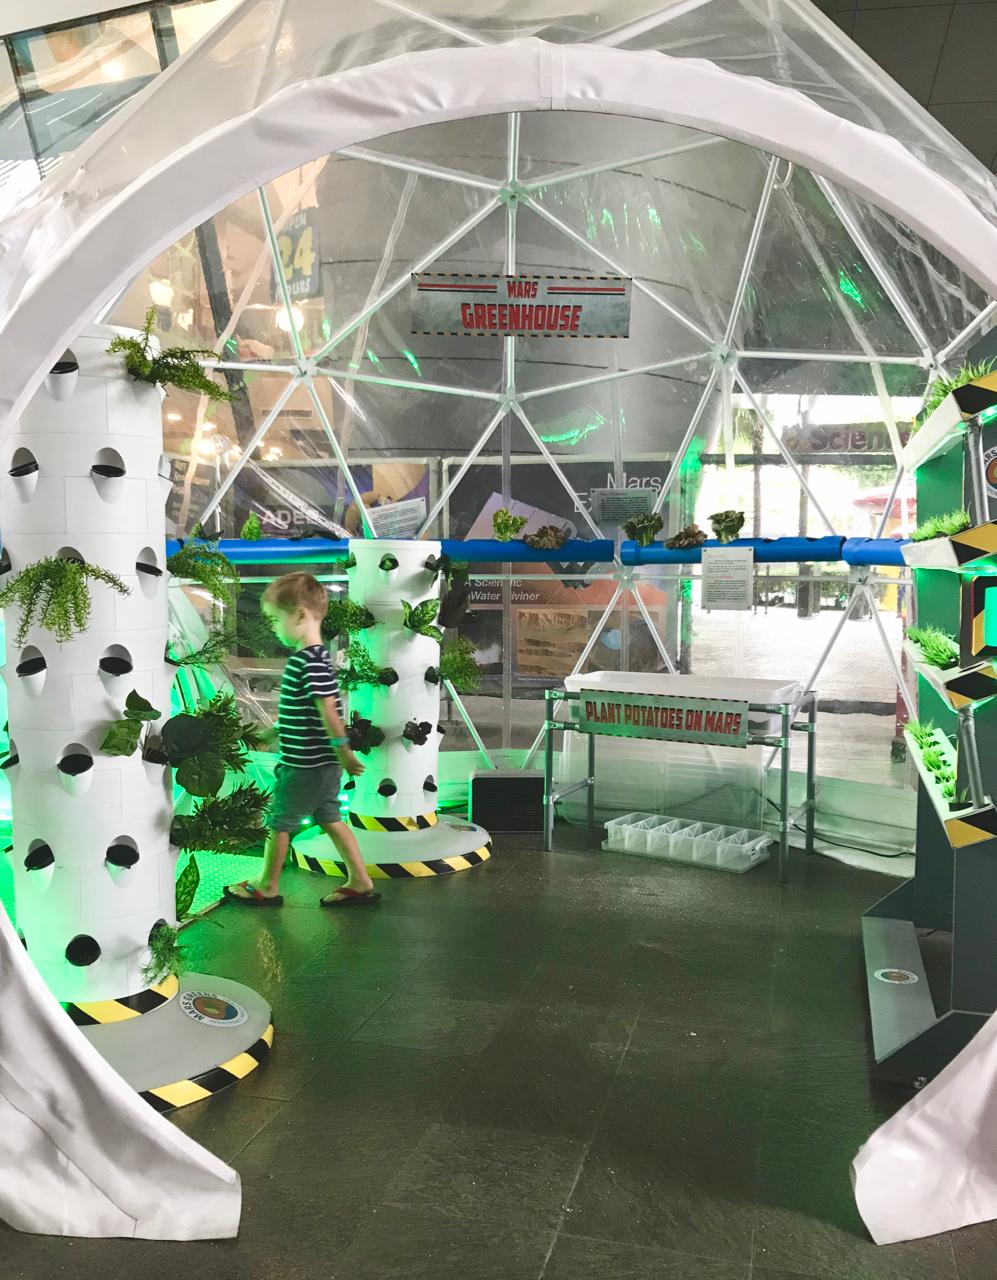 mars greenhouse.jpg